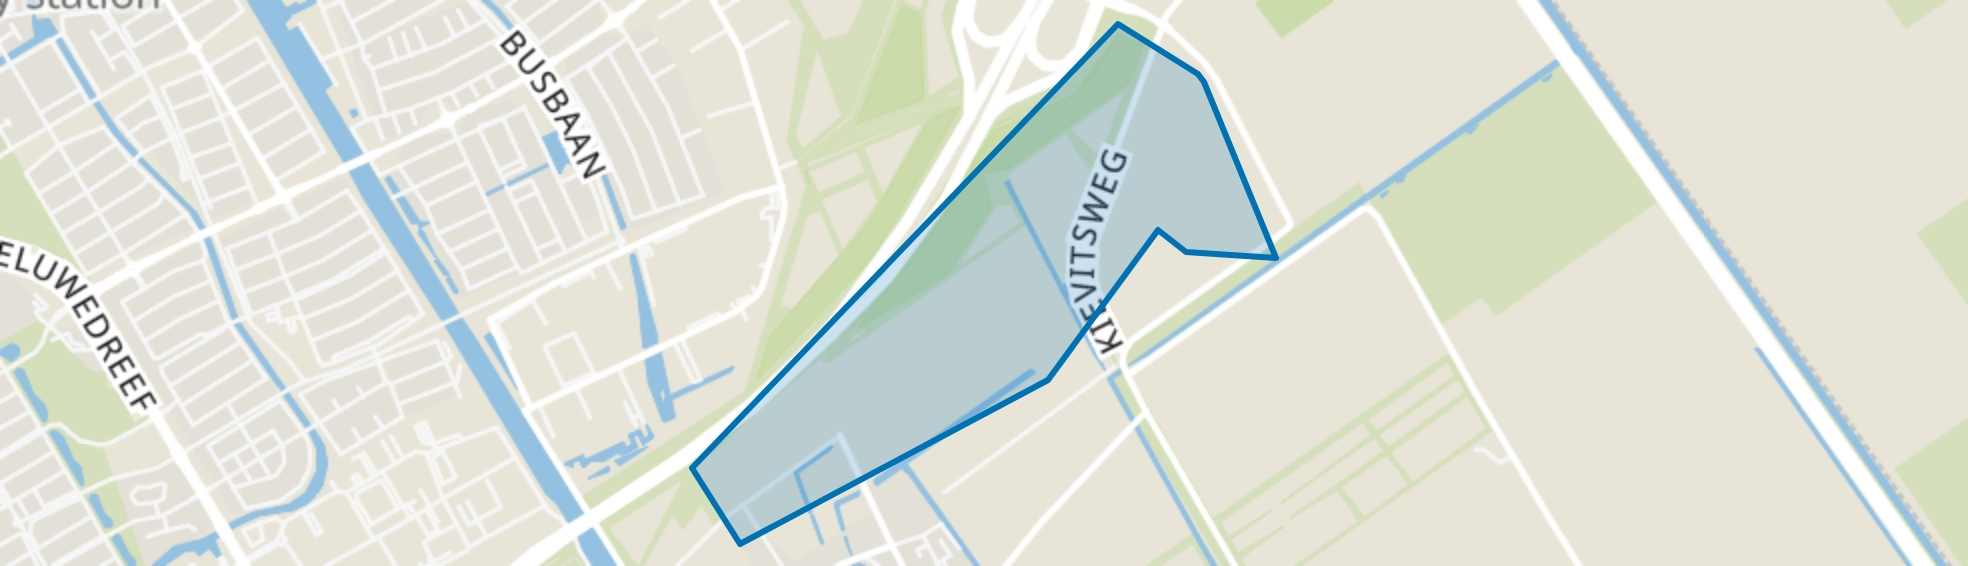 Twentsekant, Almere map